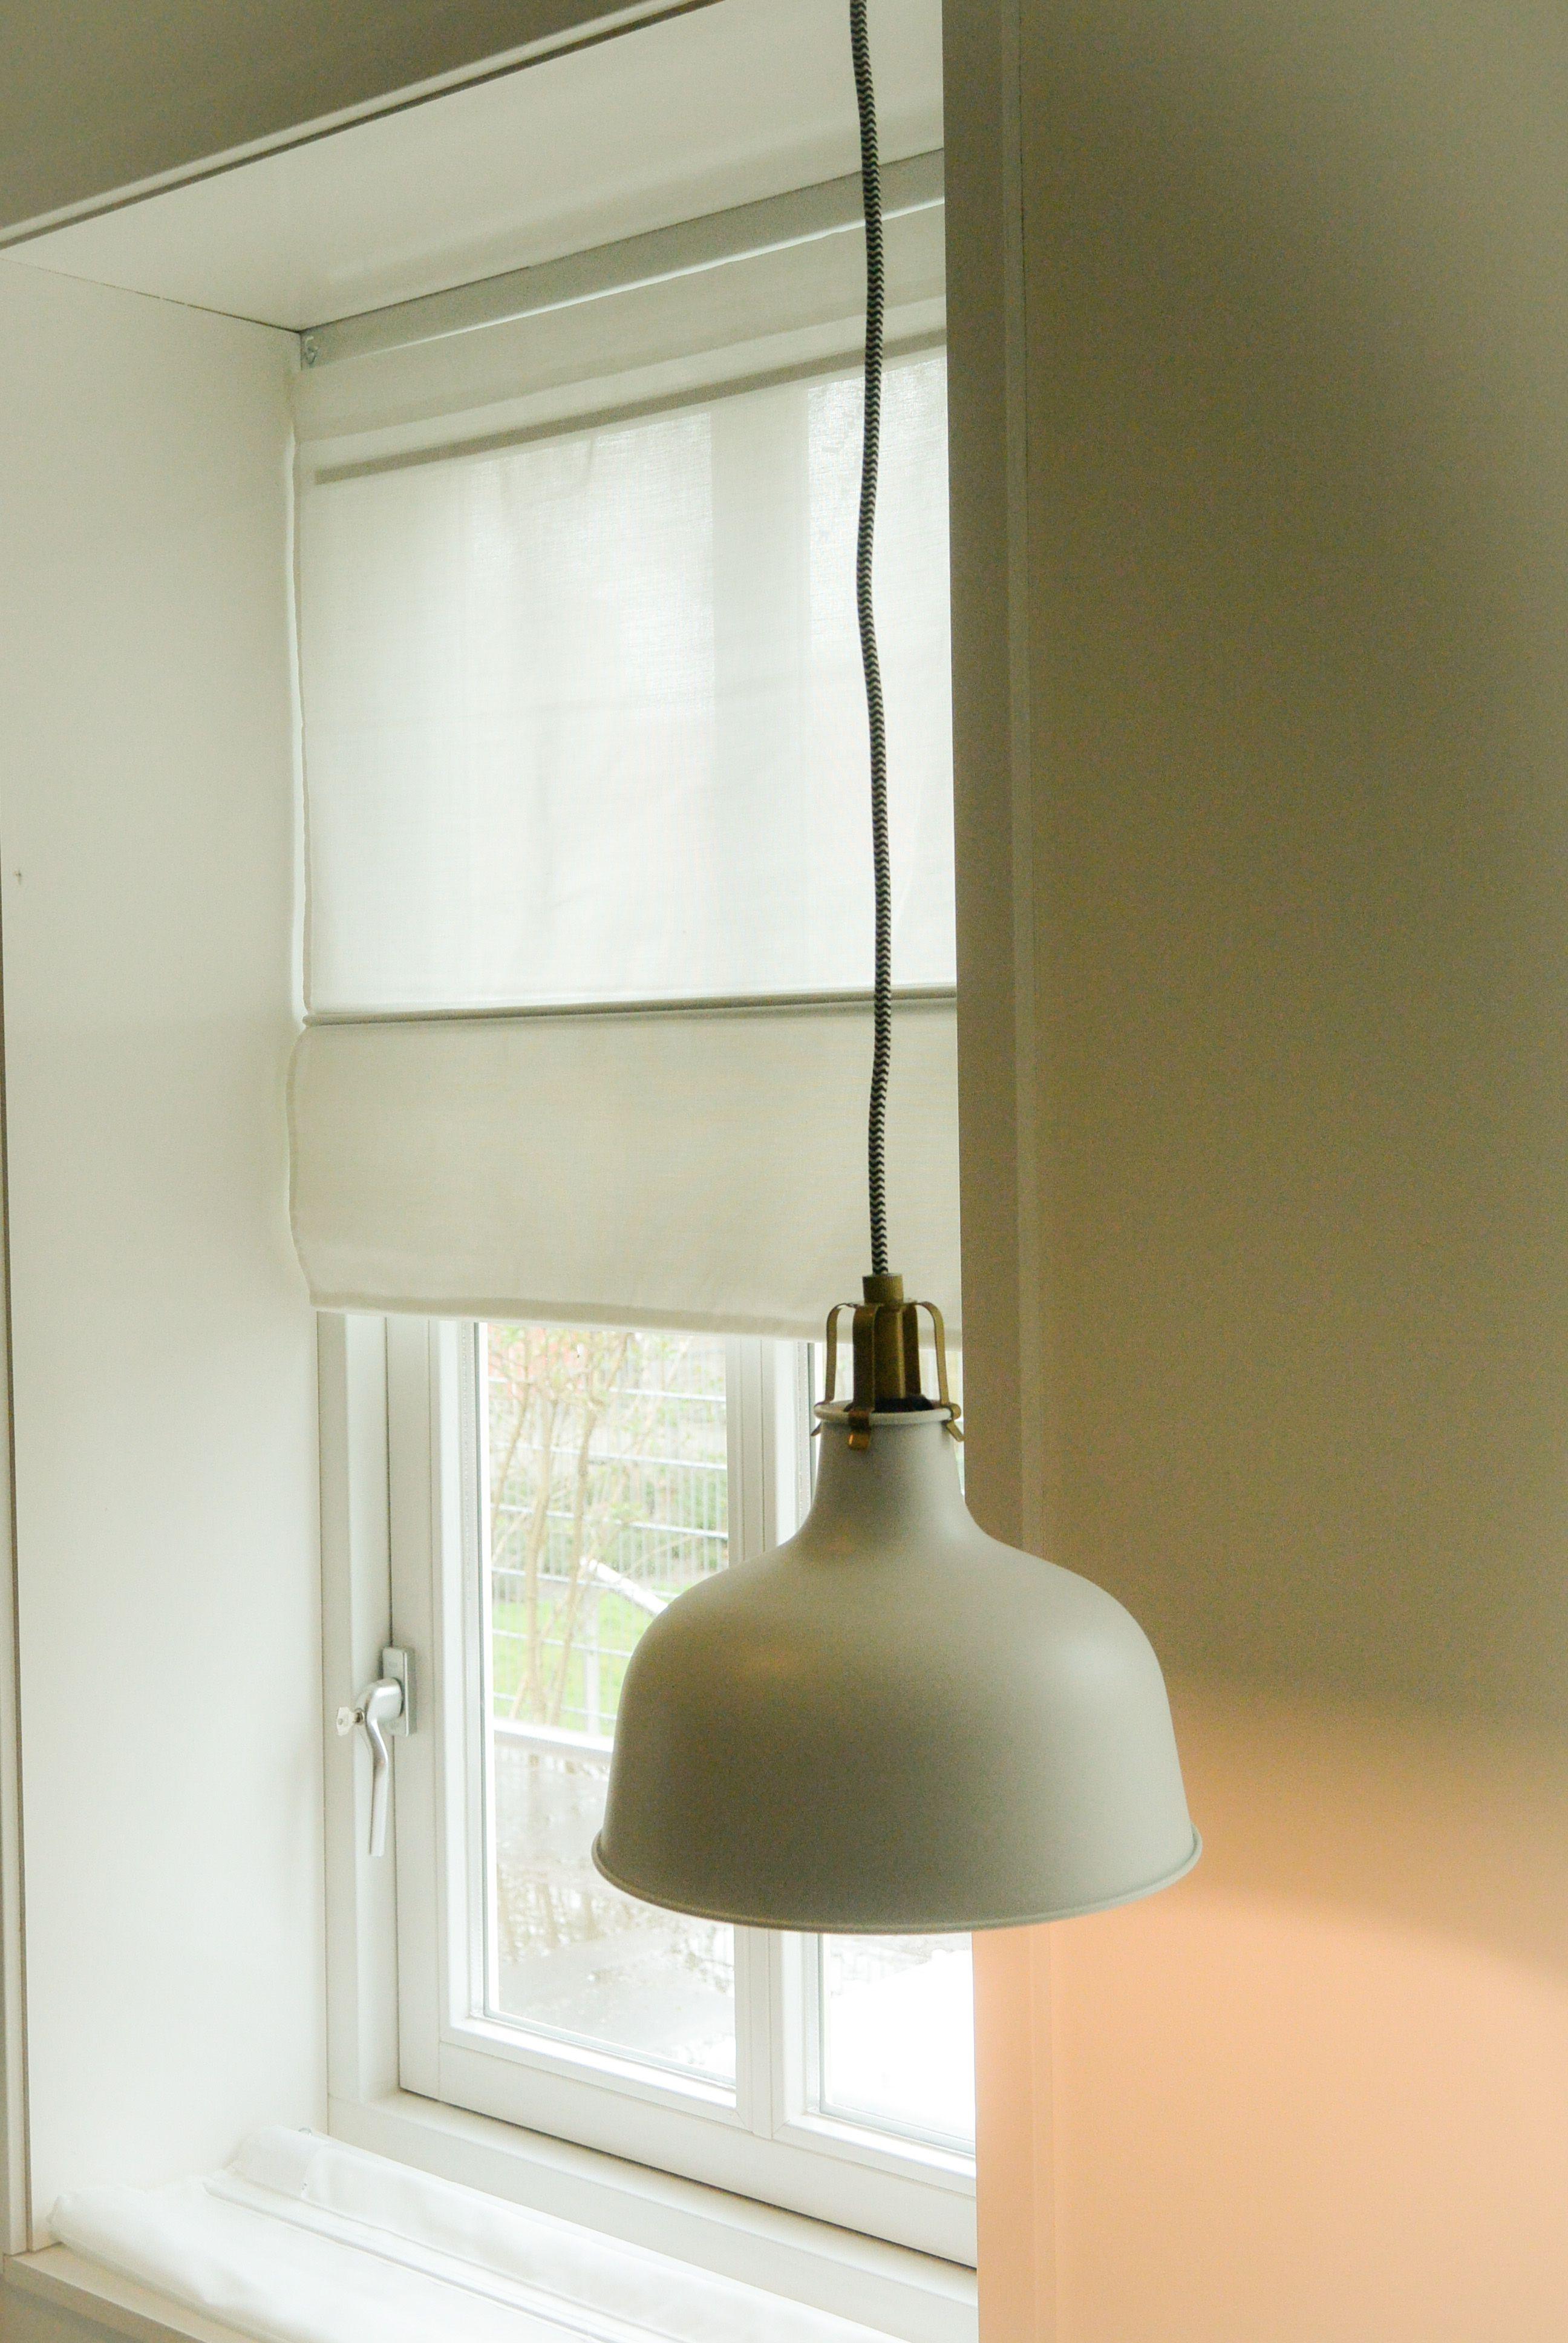 Appartement 2. tafel (karwei), stoelen en rolgordijnen(jysk), lamp ...